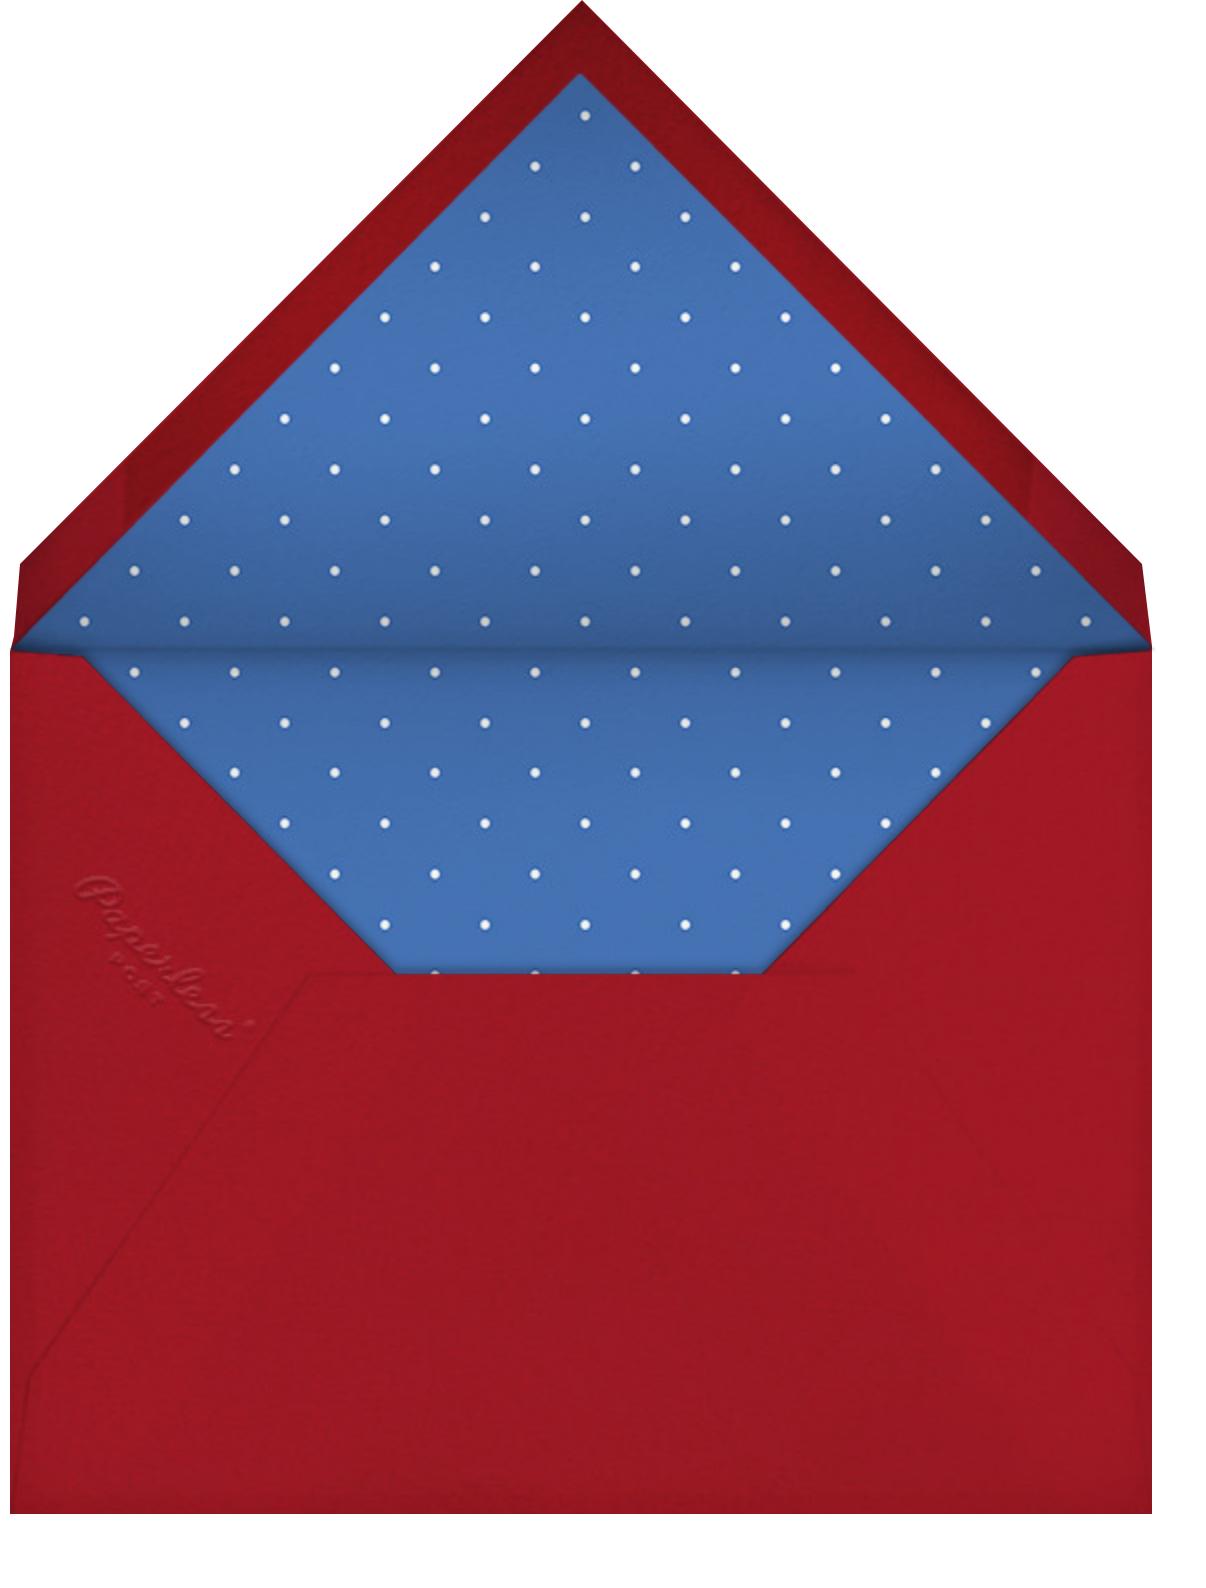 Melting Rocket Ship - Lipstick - Mr. Boddington's Studio - Barbecue - envelope back